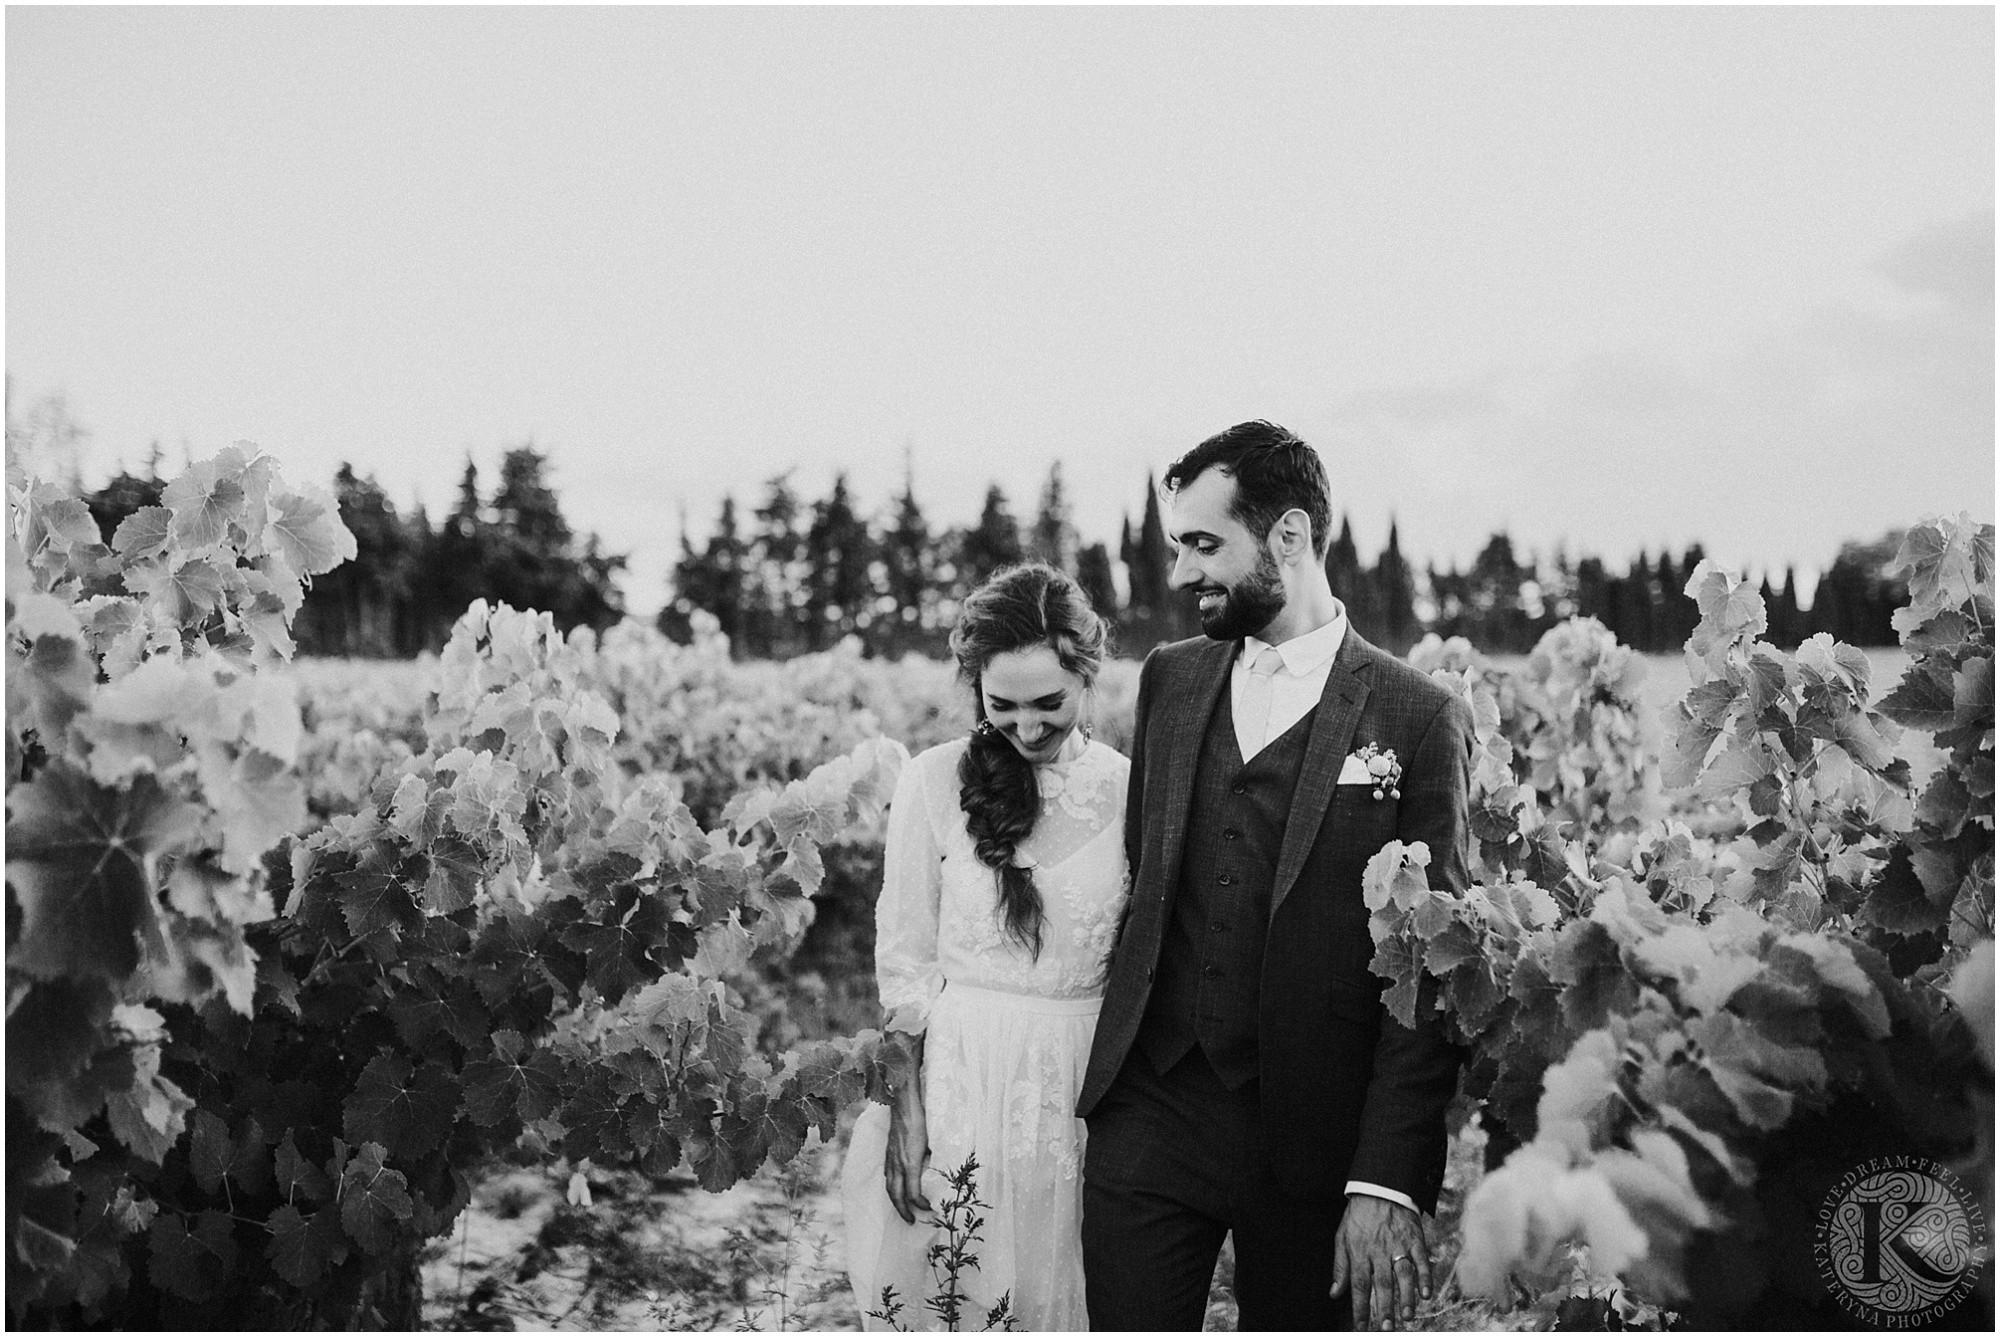 Kateryna-photos-photographe-mariage-vaucluse-provence-avignon-ferme-st-hugues_0077.jpg